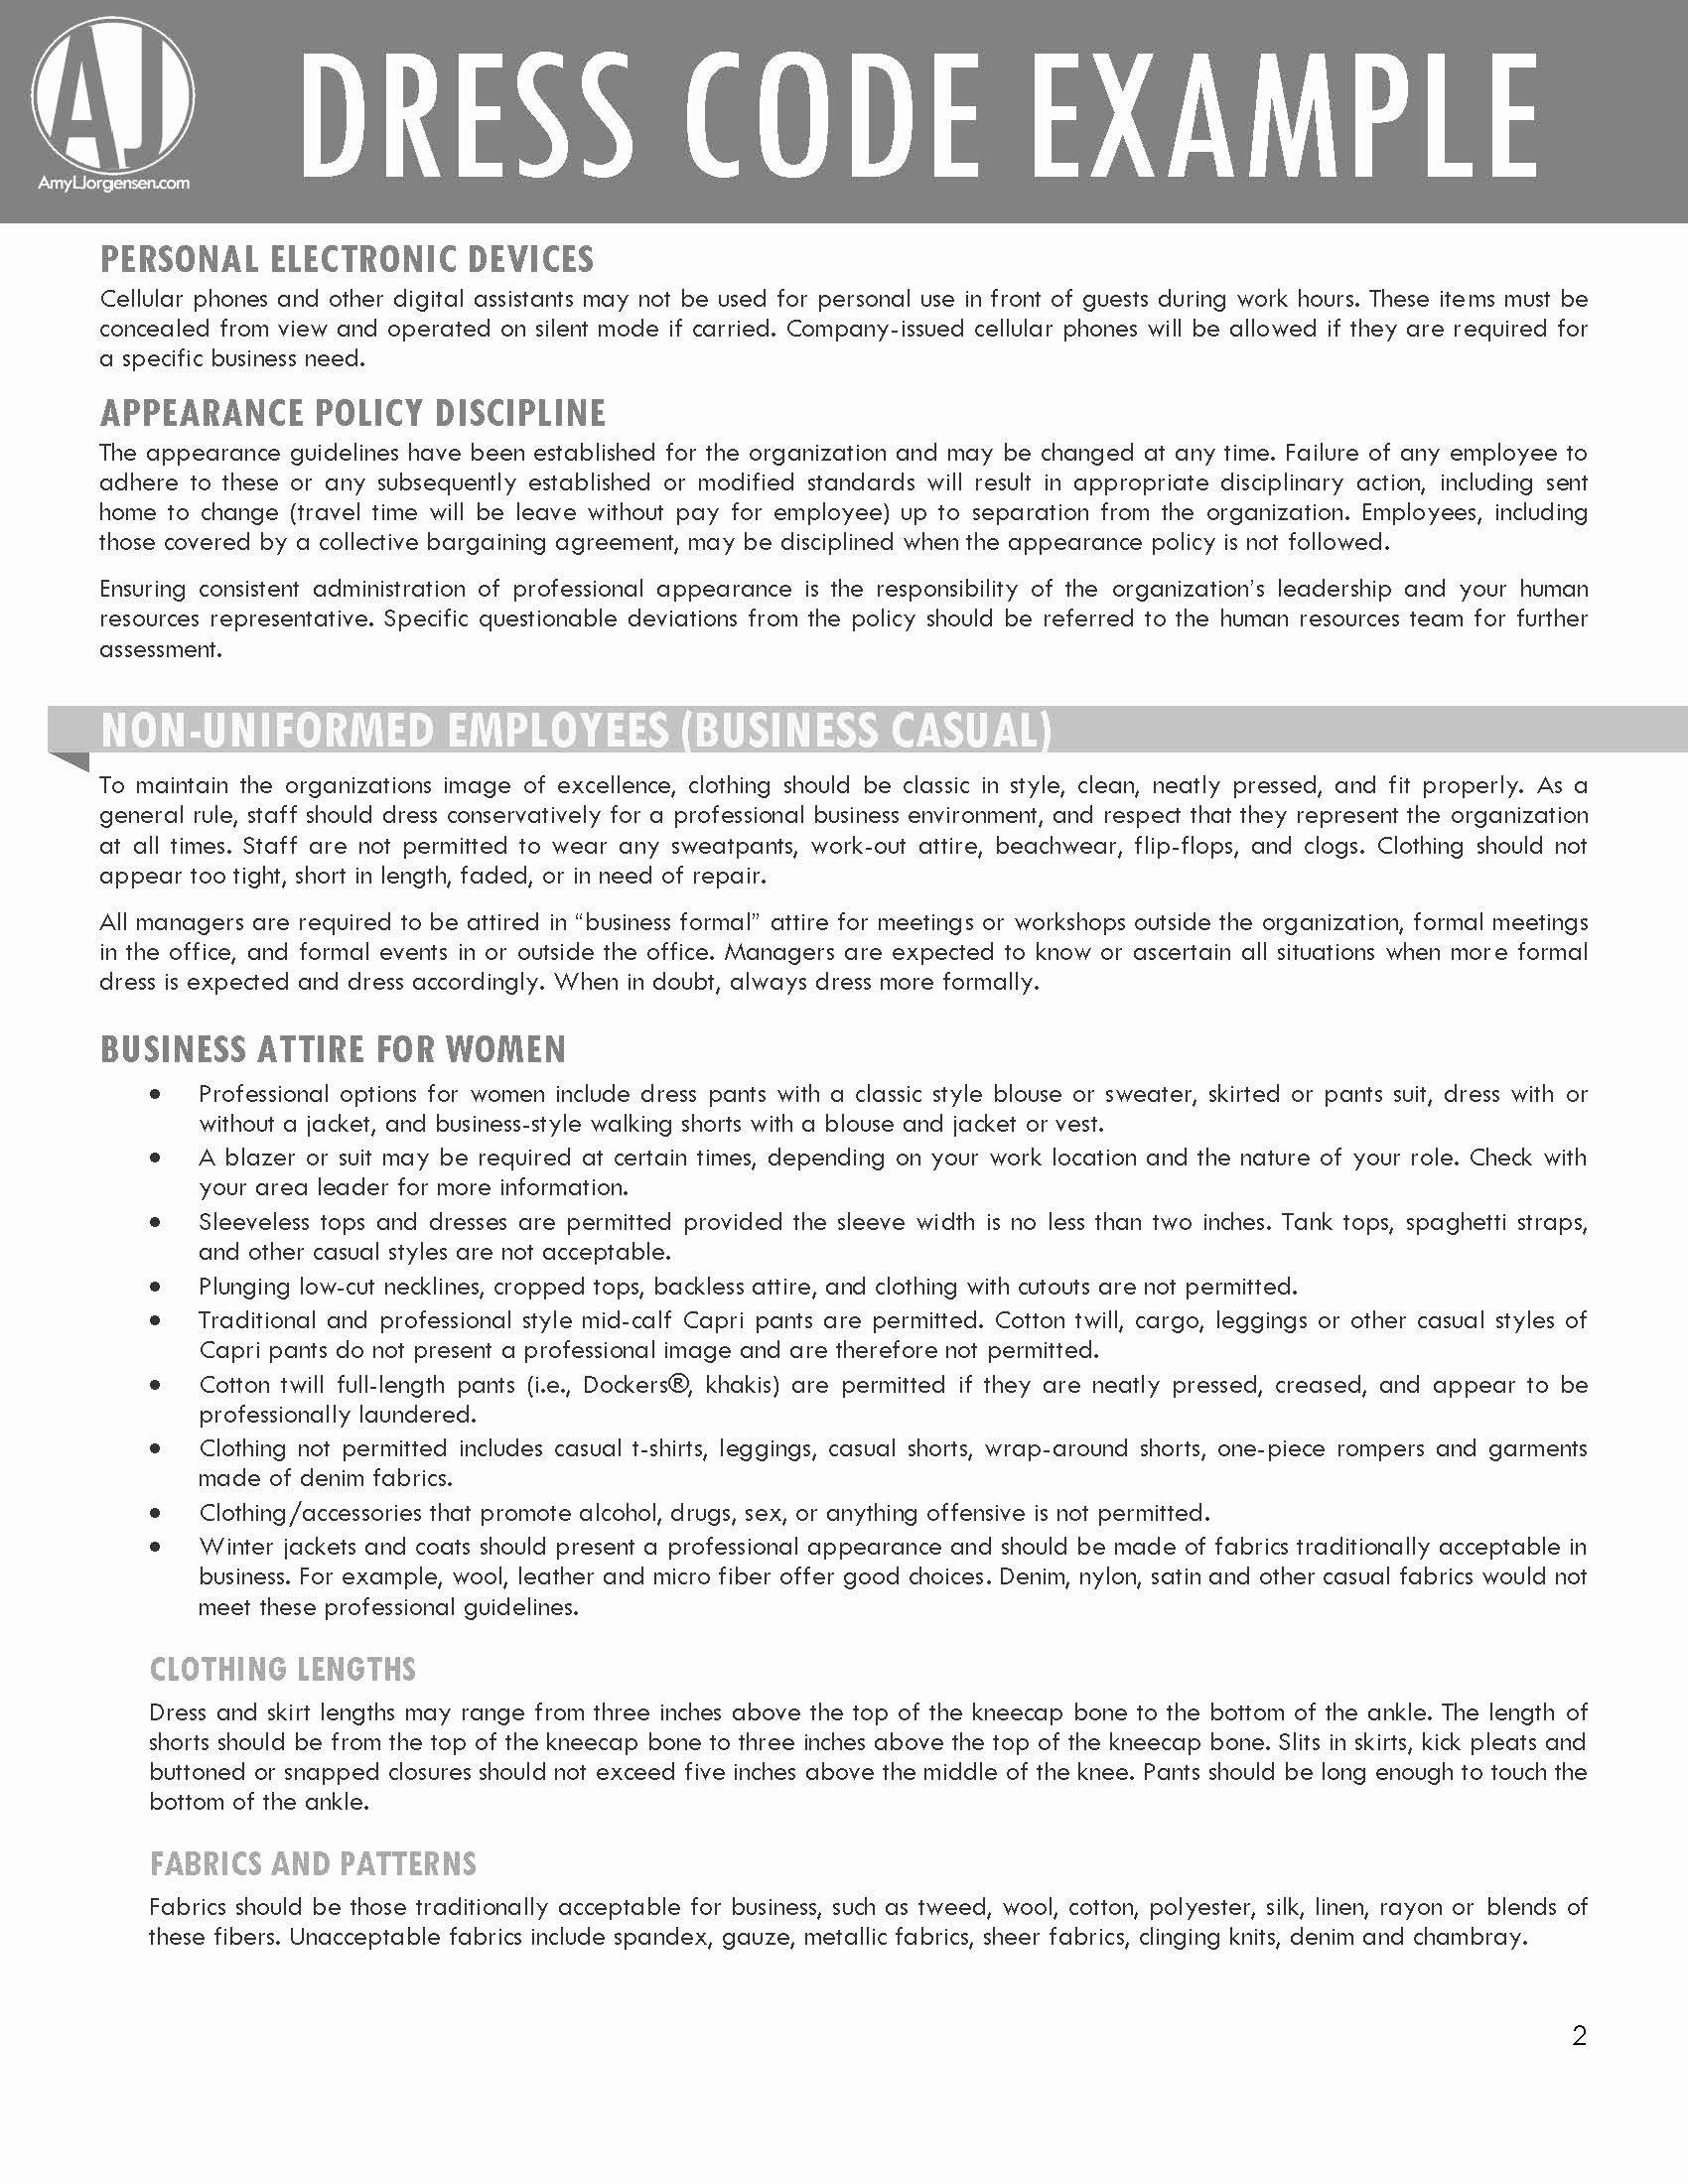 Employee Dress Code Policy Sample Elegant Dress Code Example – Amyljorgensen